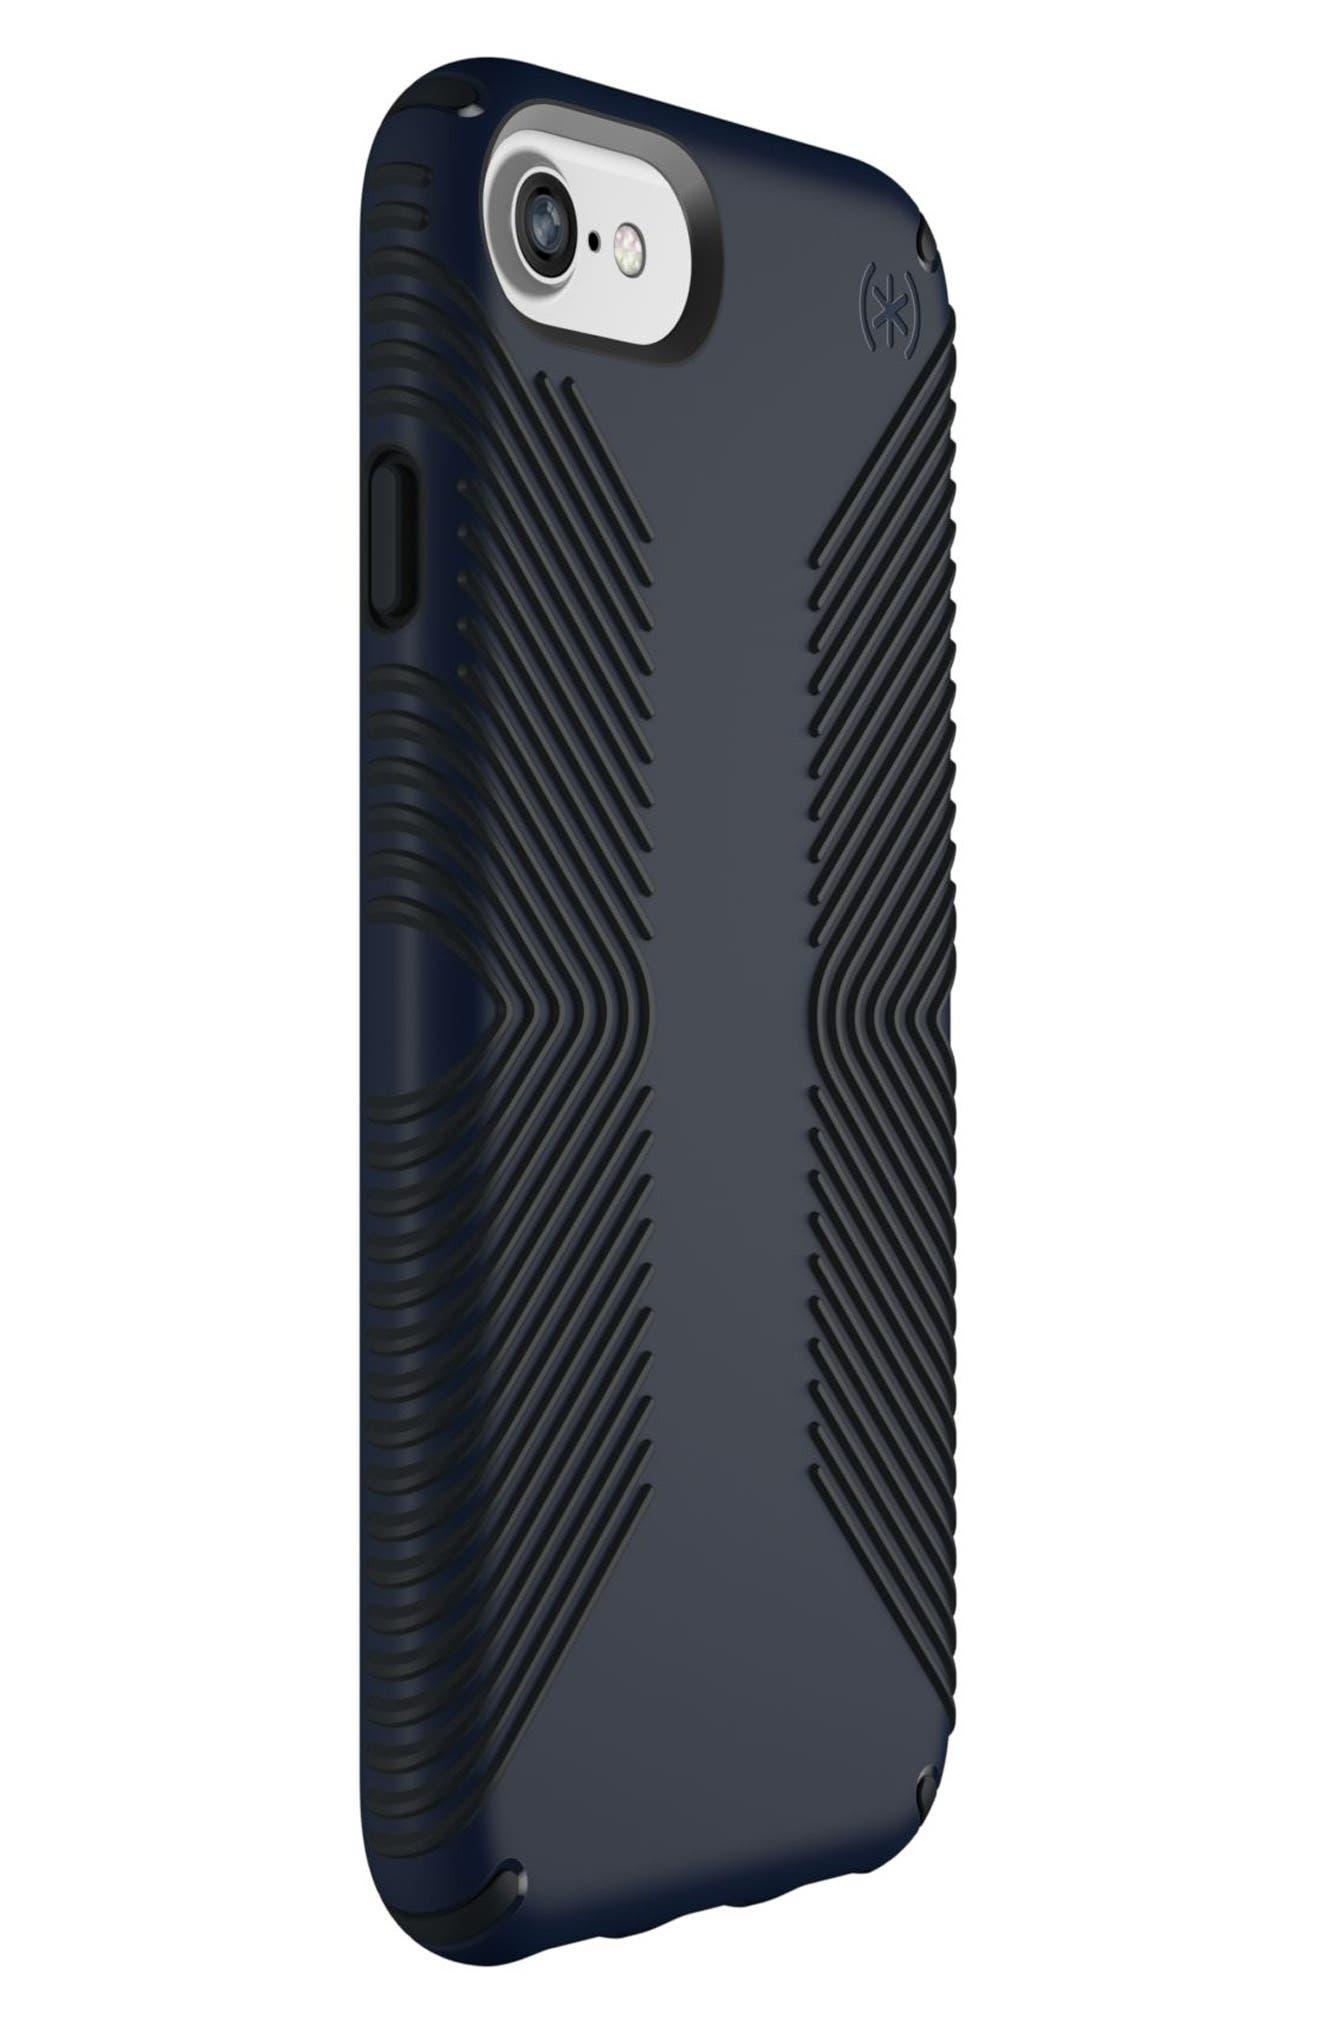 Grip iPhone 6/6s/7/8 Case,                             Alternate thumbnail 5, color,                             400